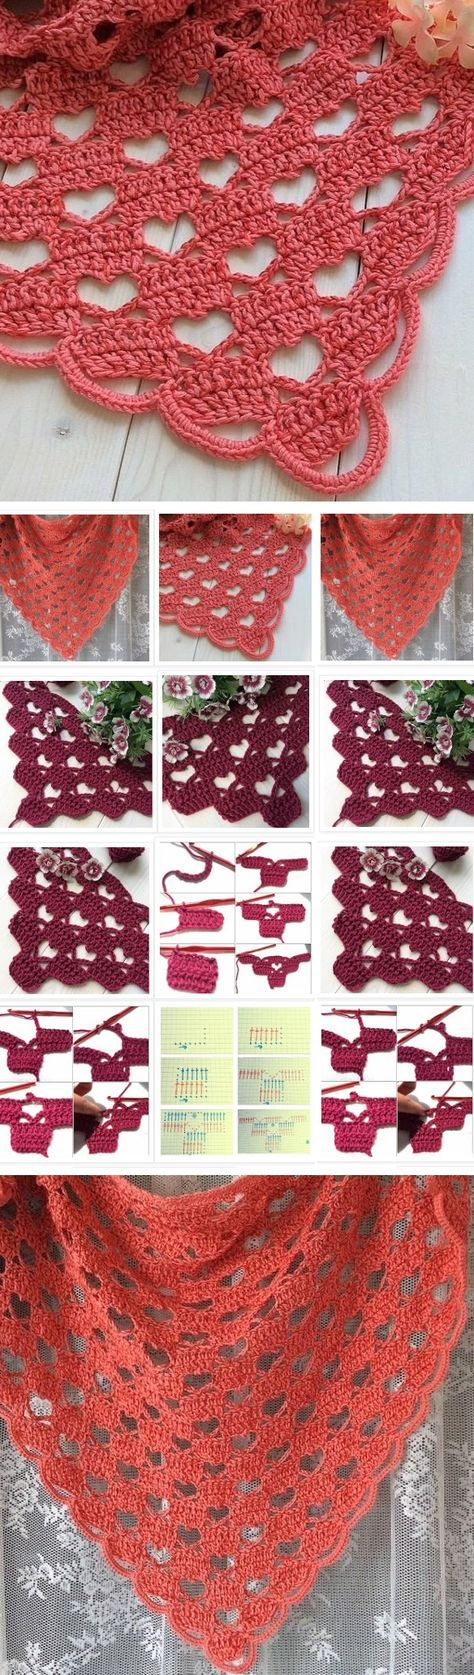 Crochet Beautiful Shawl (Sashay Yarn | Tejido, Chal y Ganchillo